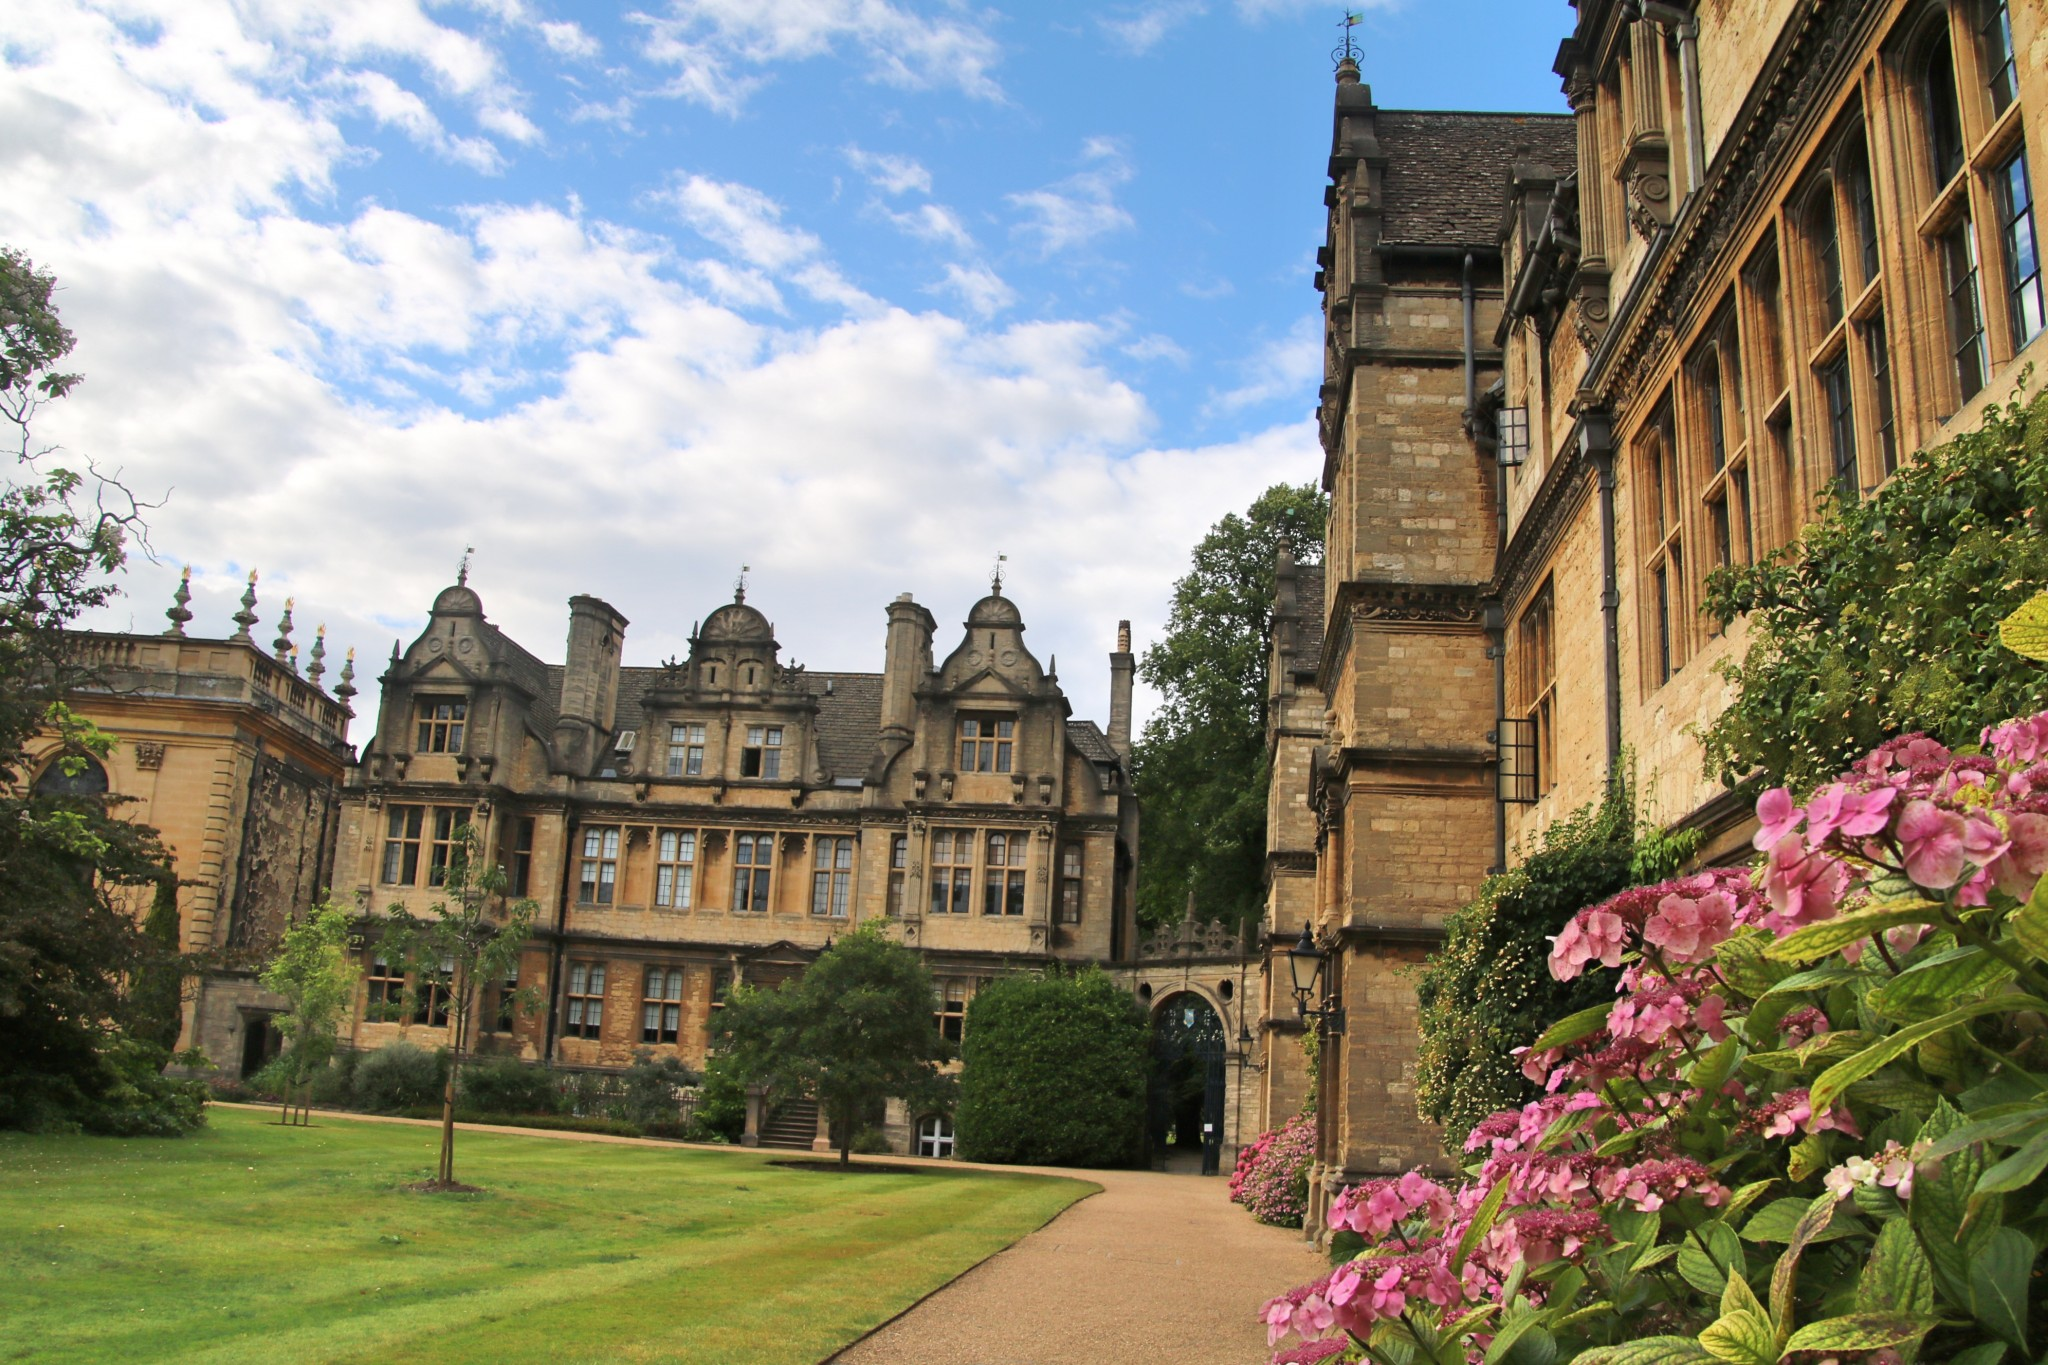 Oxford Université vitesse datant Perth wa rencontres en ligne